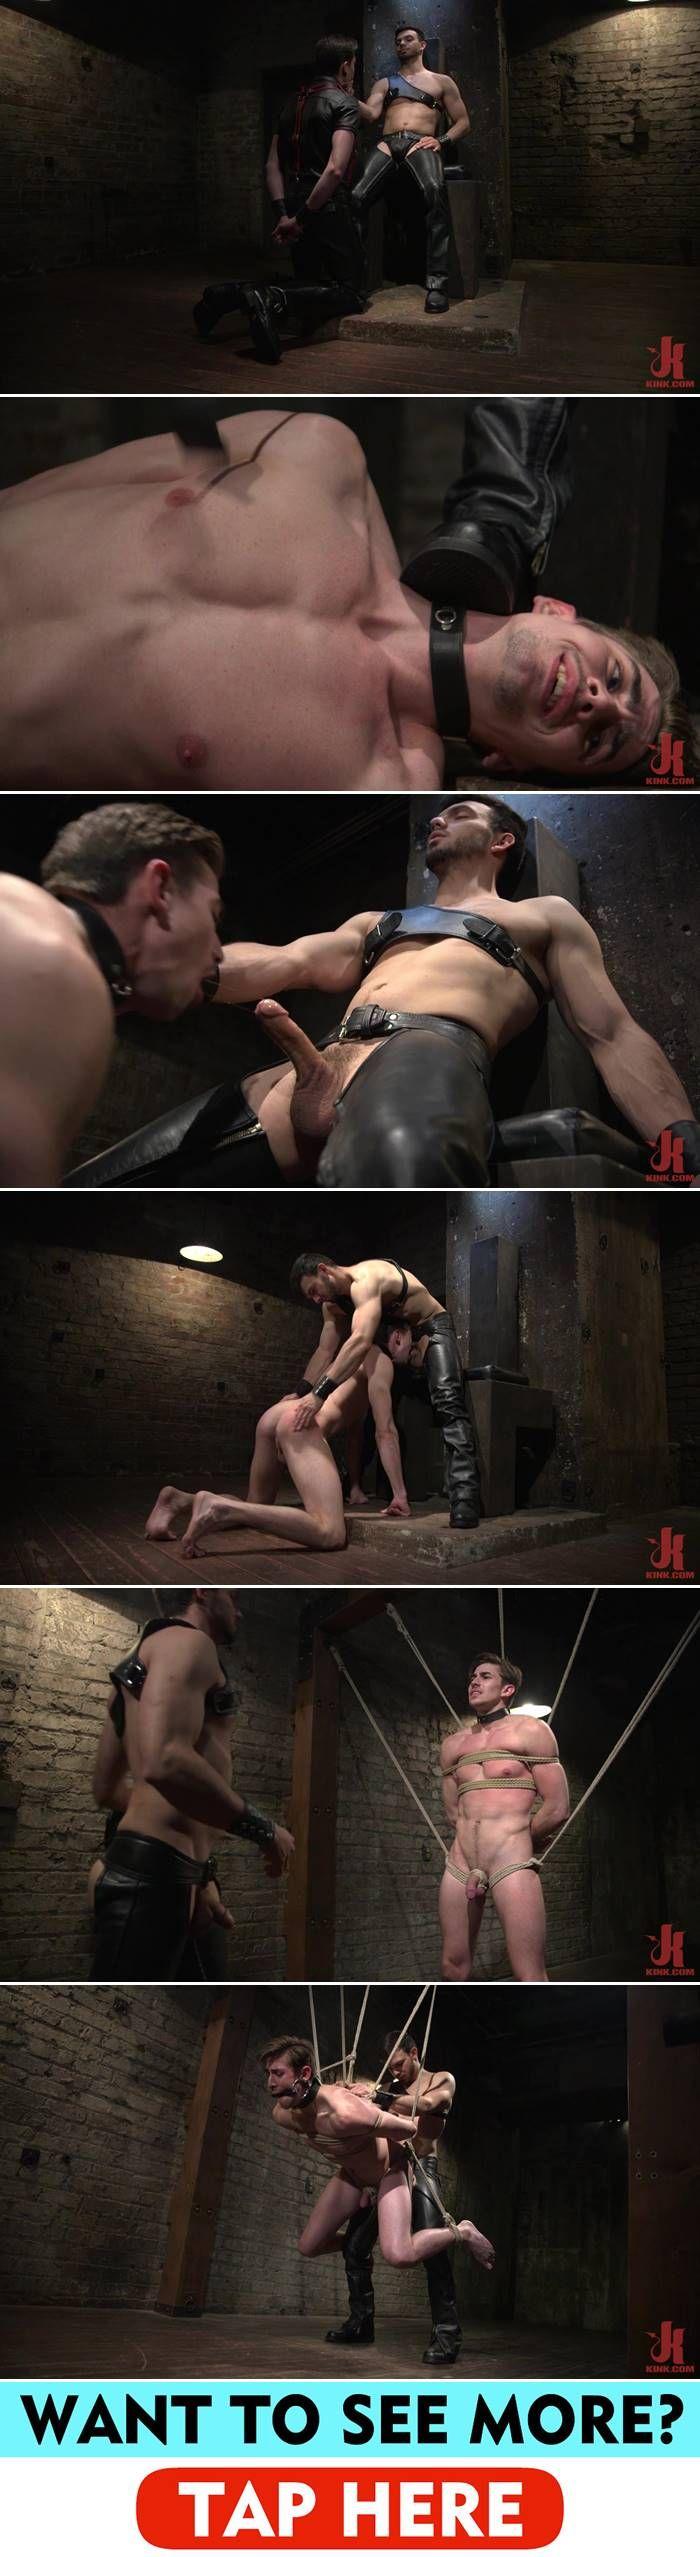 Kinkmen: Jason Maddox & Jack Hunter - Leather & Torments 1